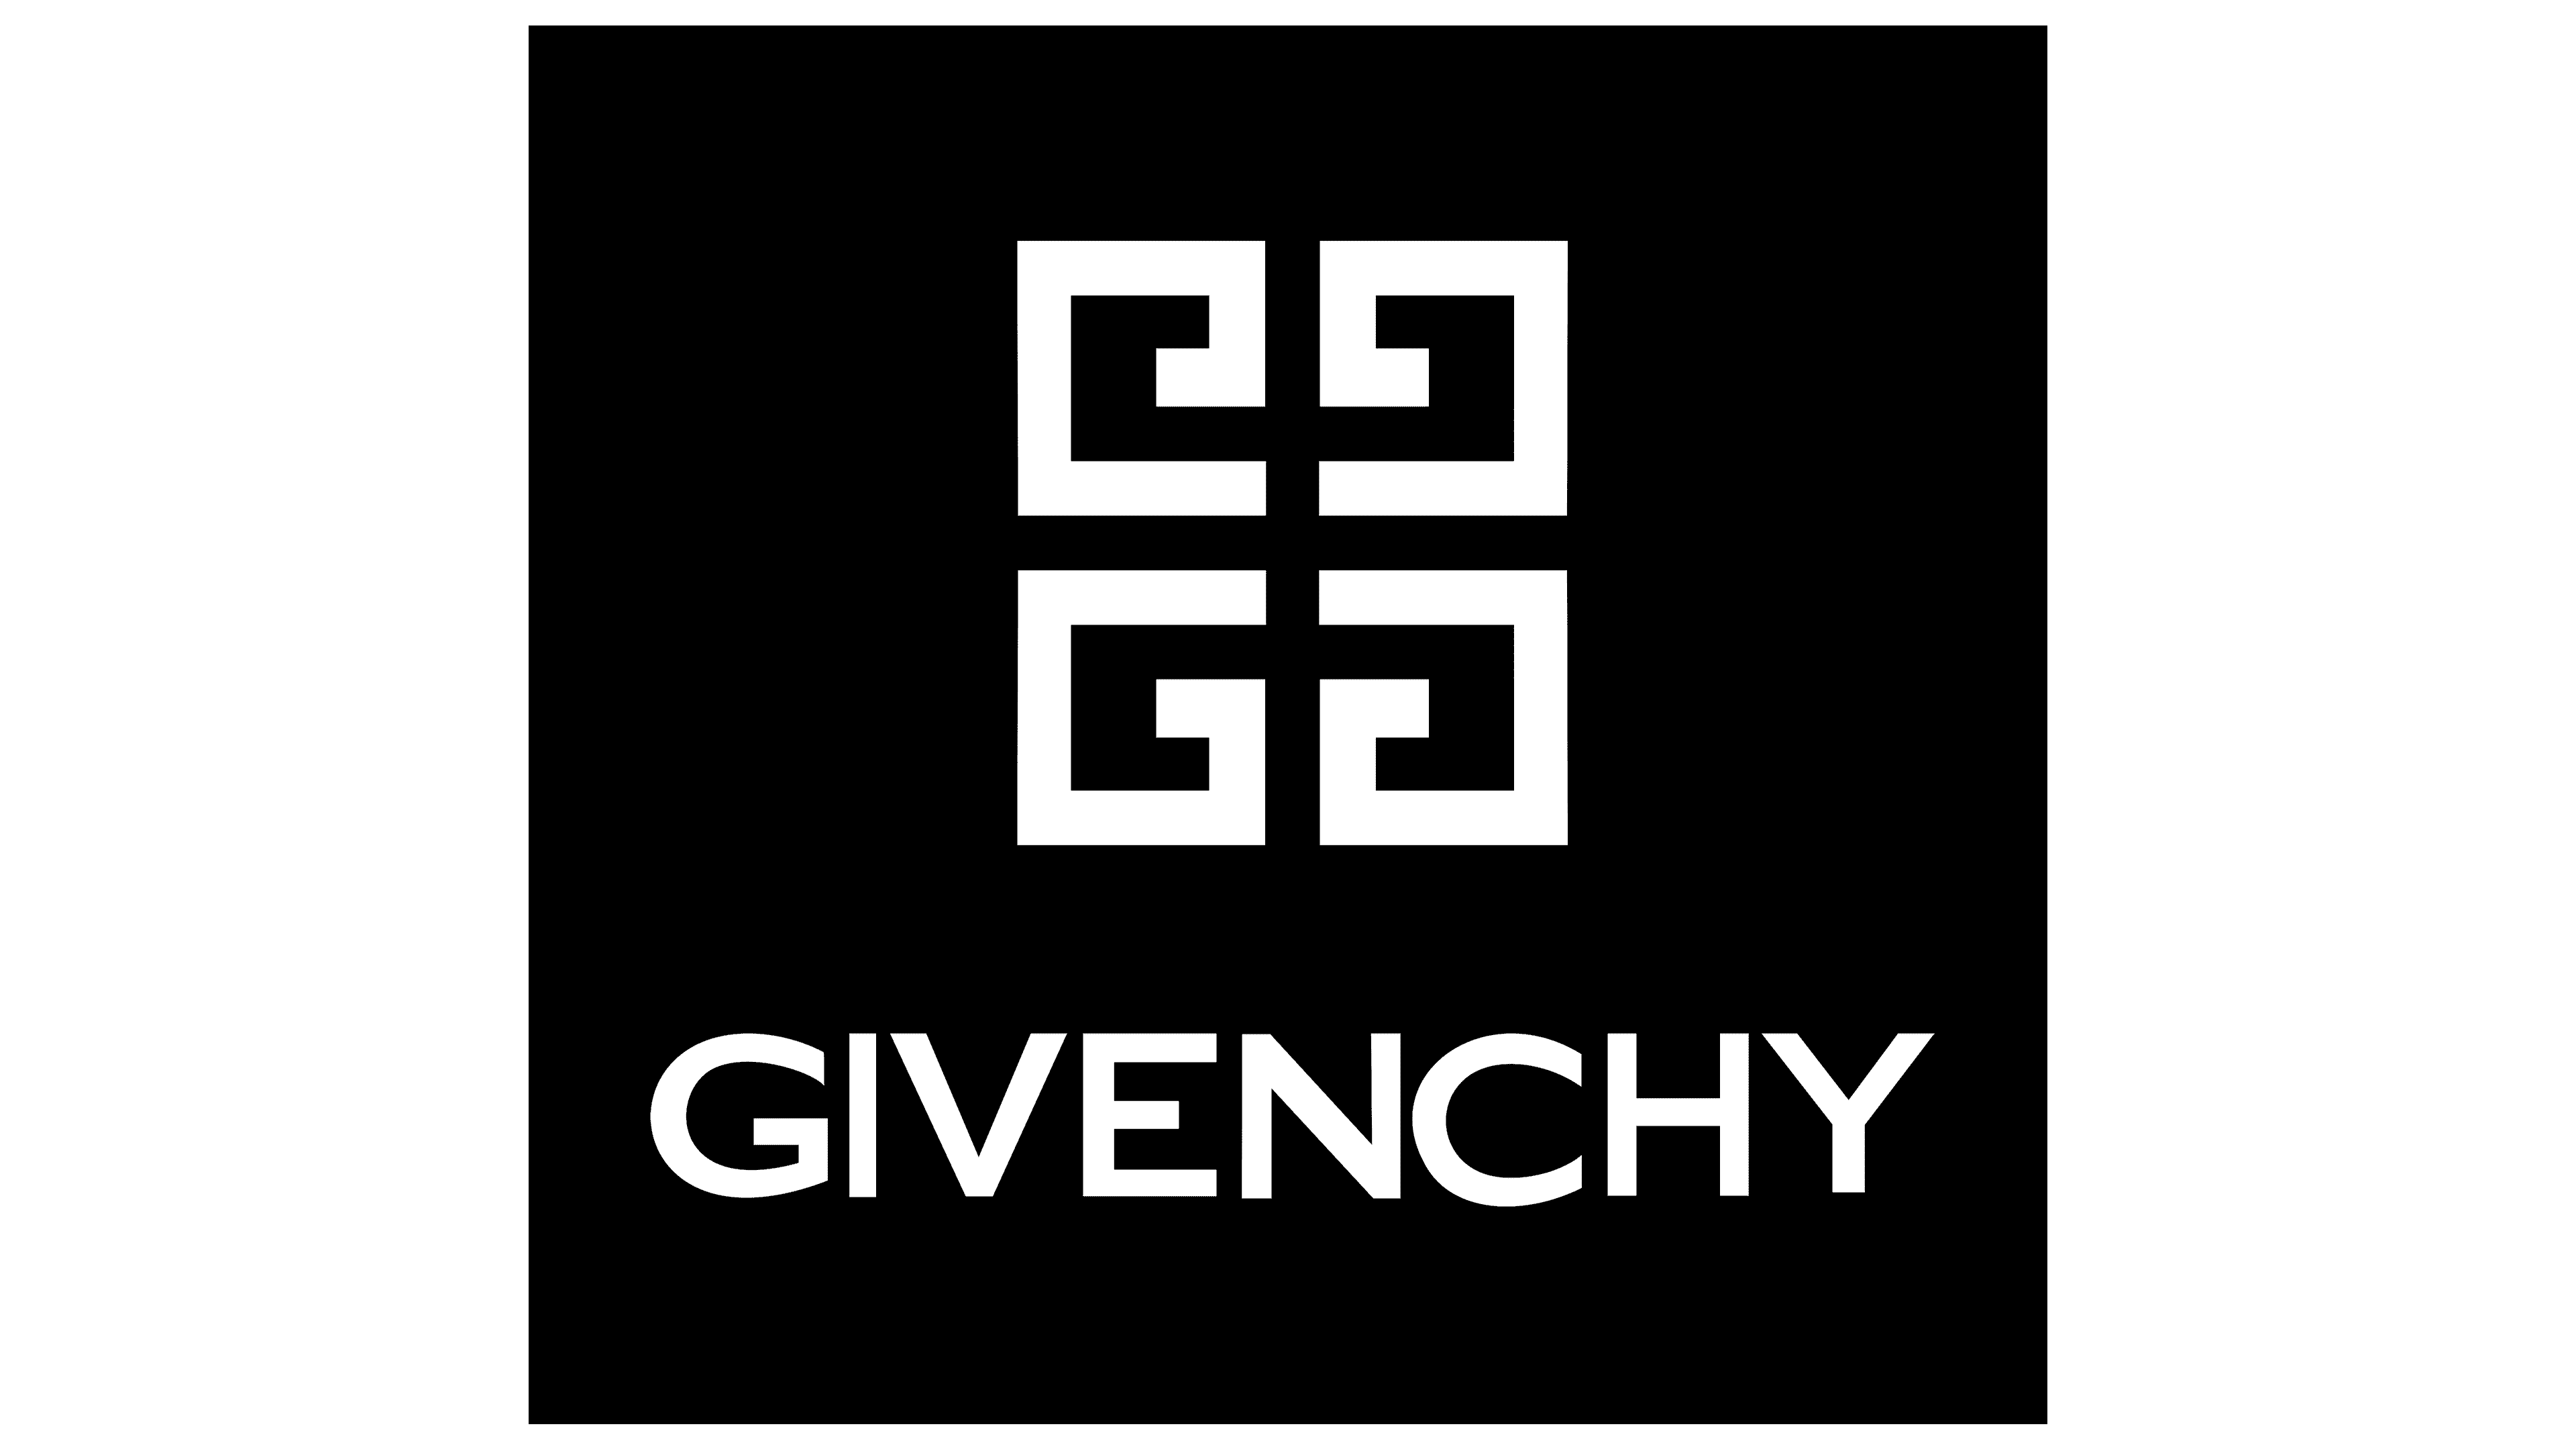 جفينشي-Givenchy